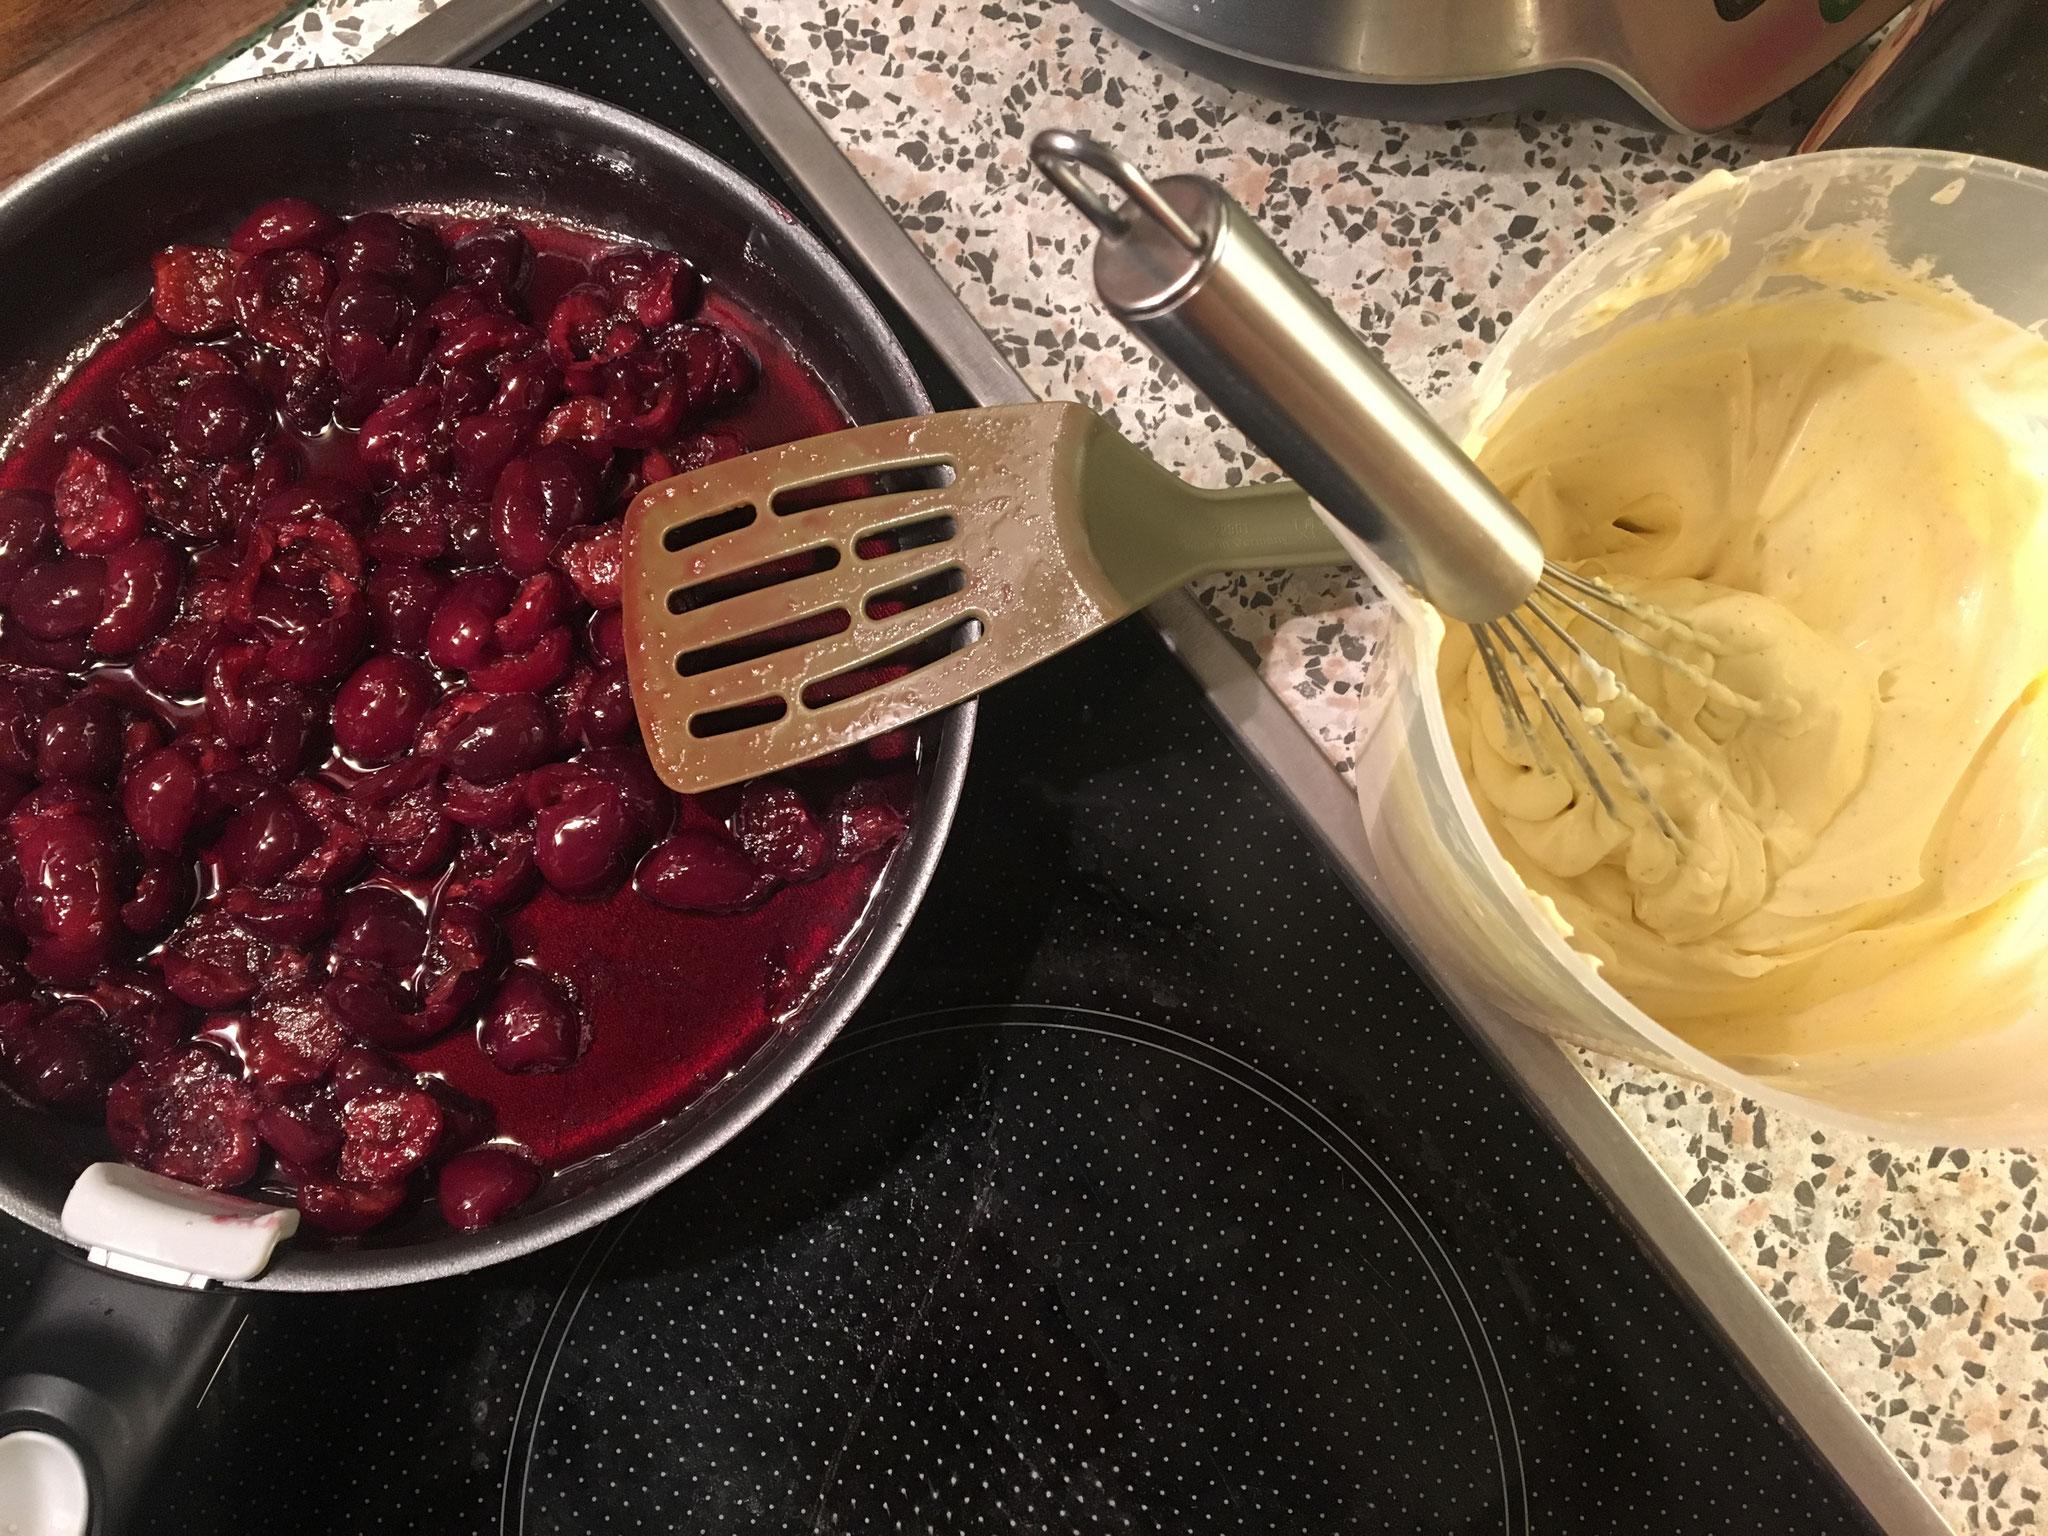 Preparing Cherry Tiramisu from the Gino d´Acampos book Italian Escape